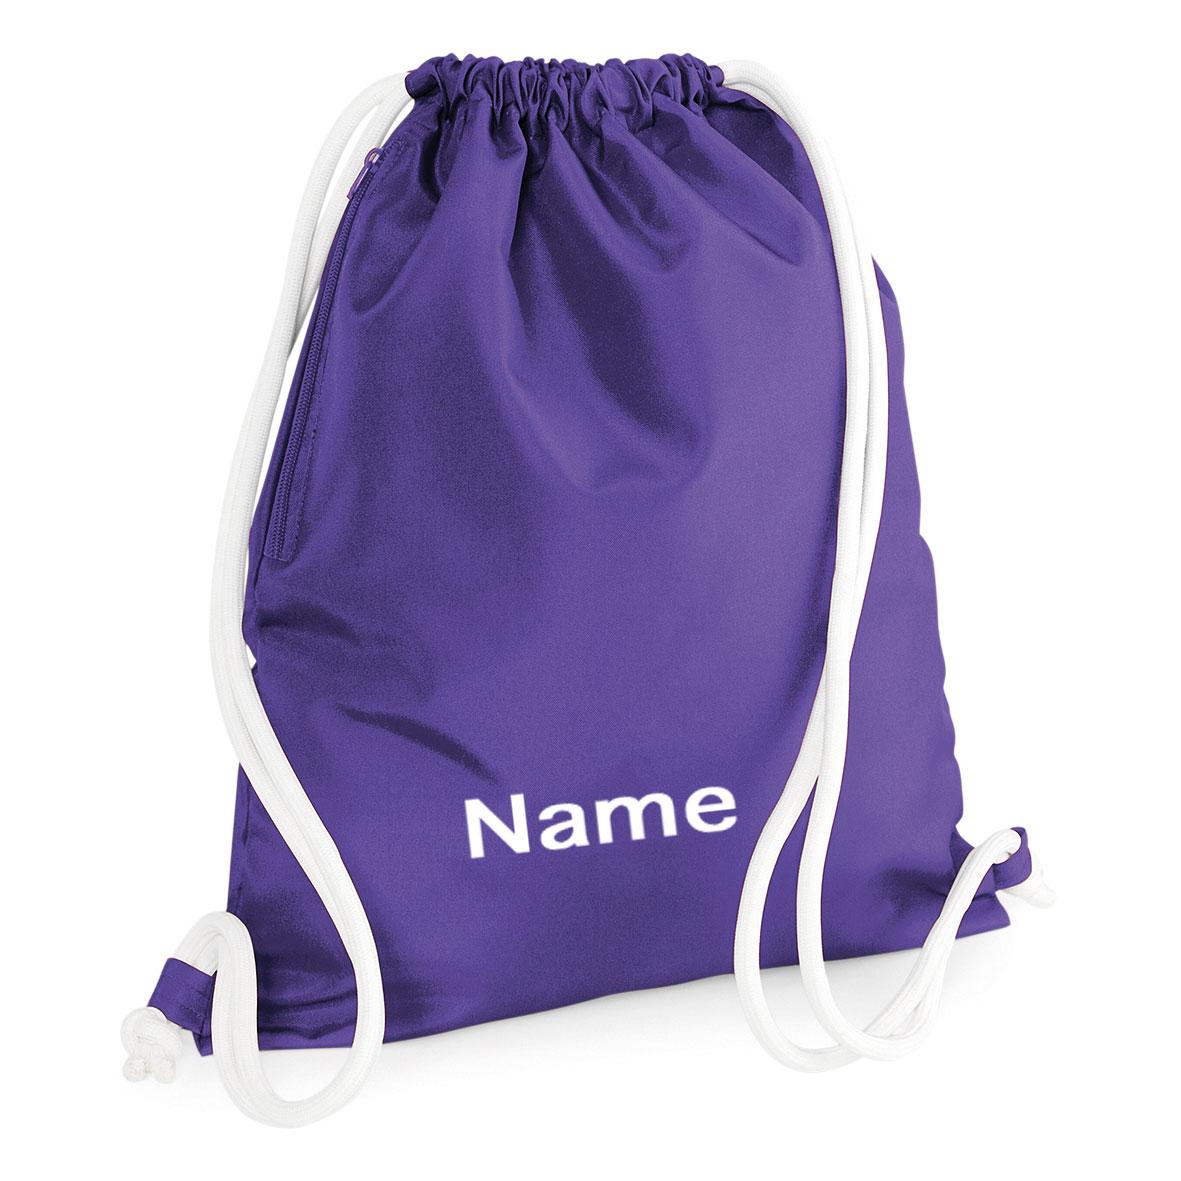 6ee33ec683933 Sofasurfer® Sportbeutel Turnbeutel mit Namen bedruckt Rucksack 40x48  personalisiert